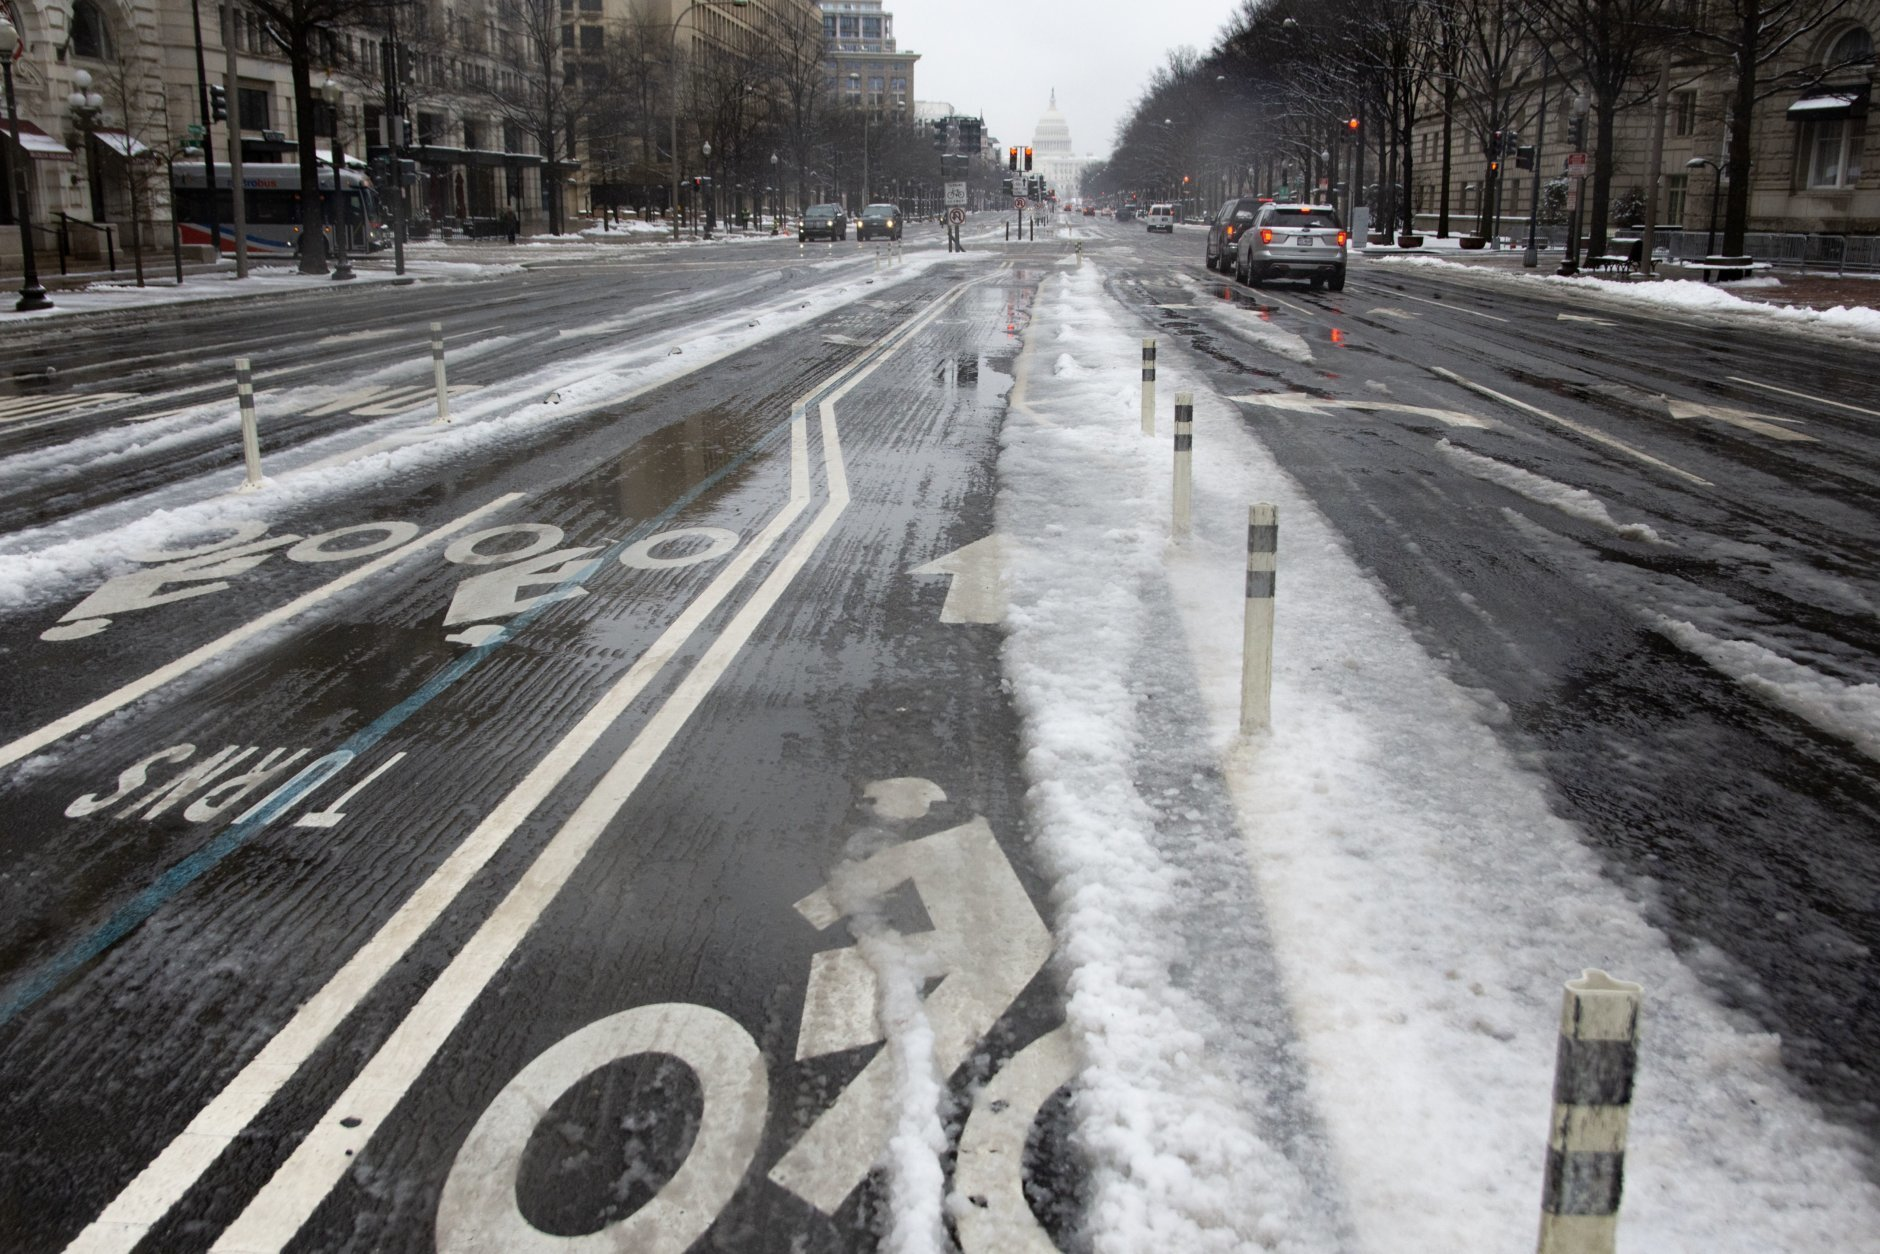 No bikes on Pennsylvania Avenue, where commuting was slow on Wednesday between slushy road surfaces and caravans of treatment vehicles. (WTOP/Alejandro Alvarez)